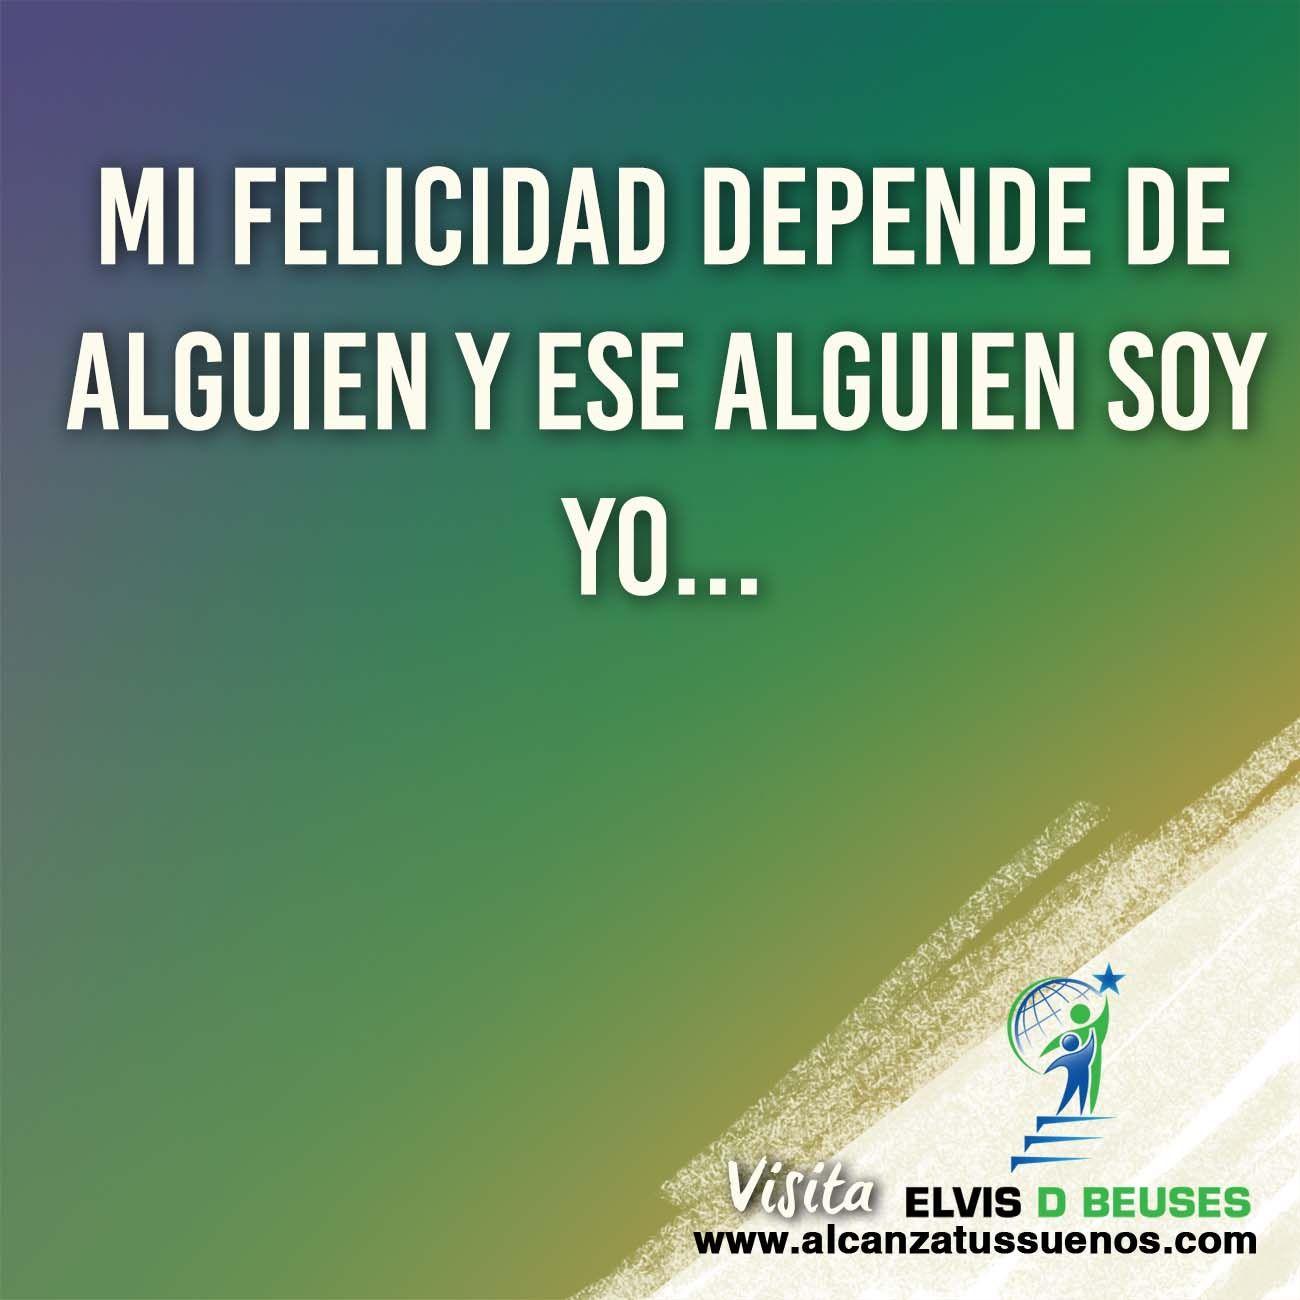 Mas visitando http://www.alcanzatussuenos.com #actitud #esperanza #buenavibra…